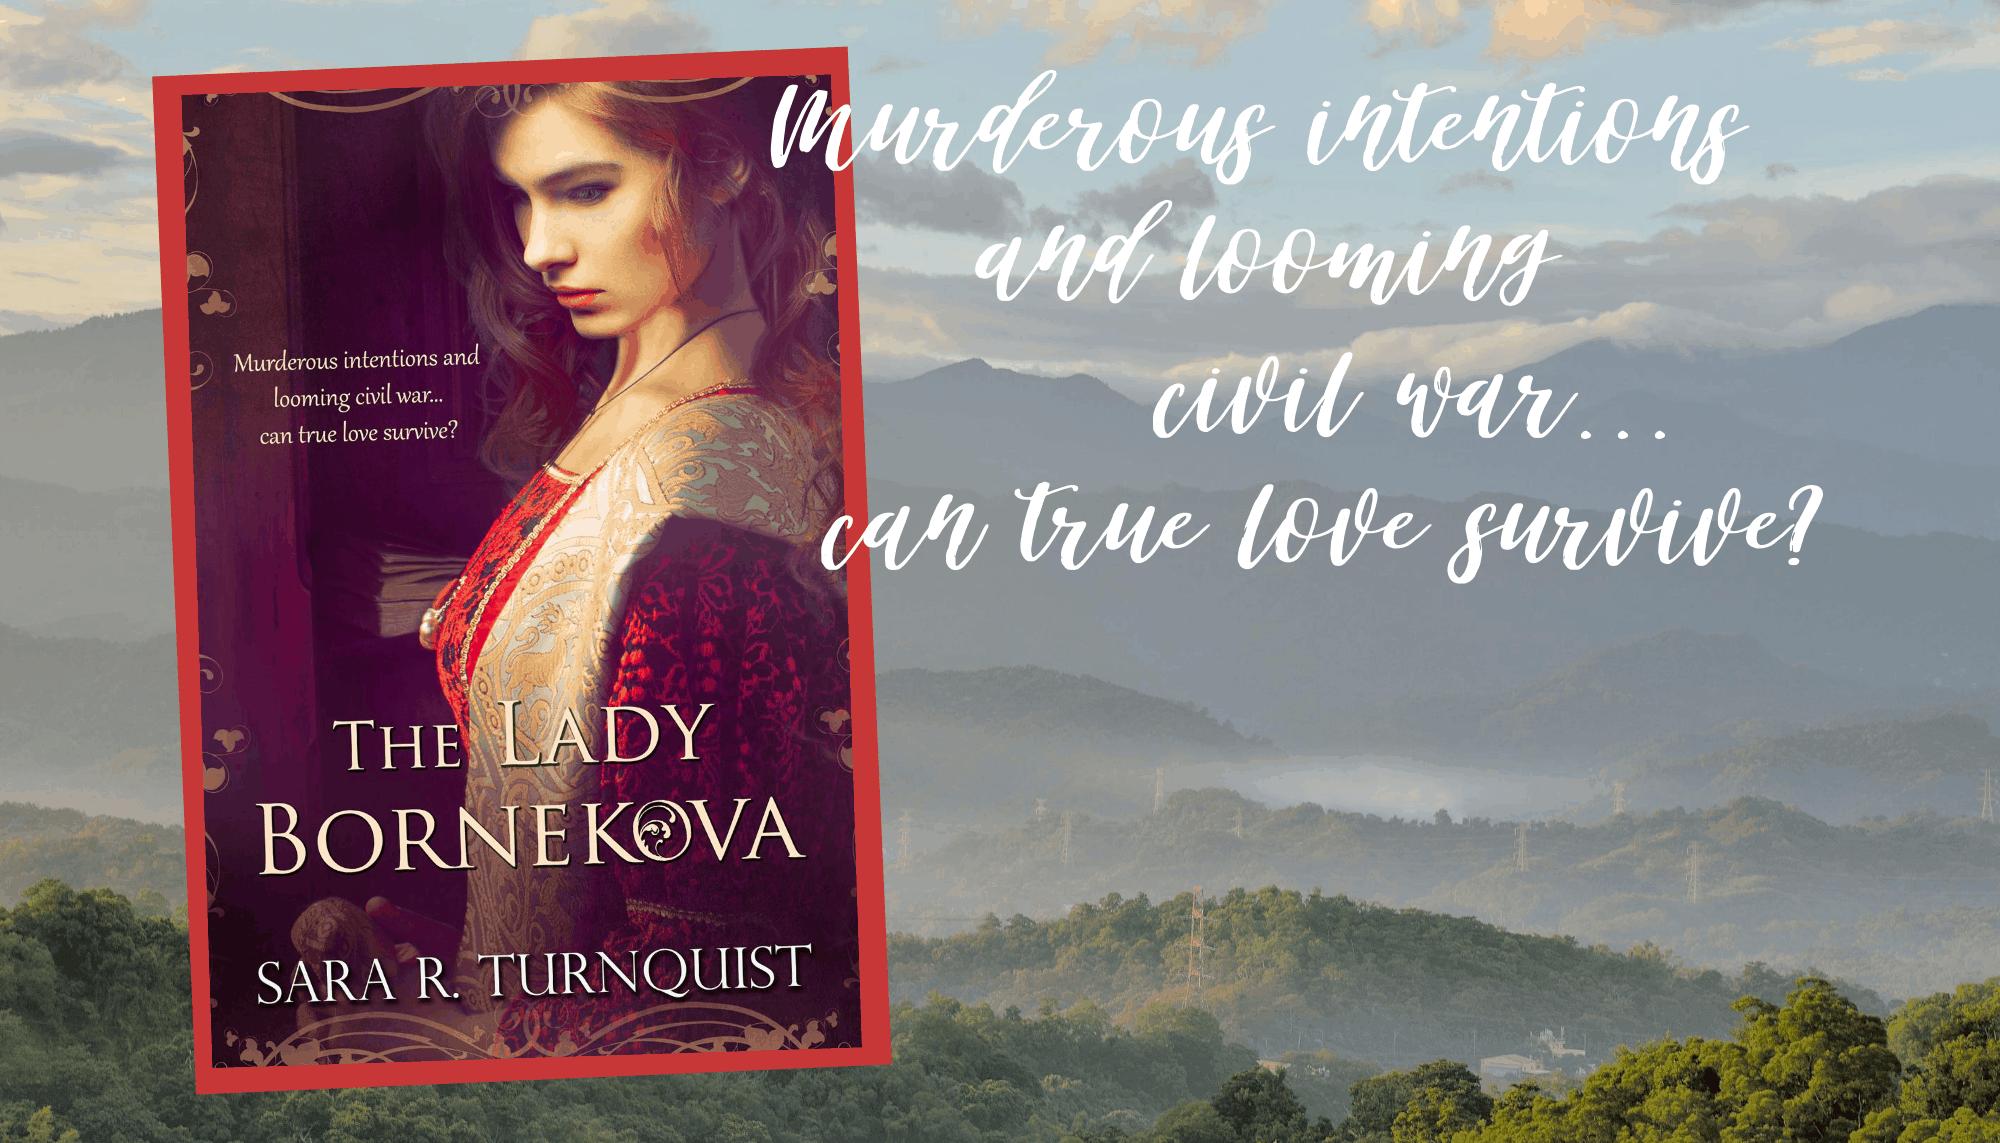 Copy of Lady Bornekova for website